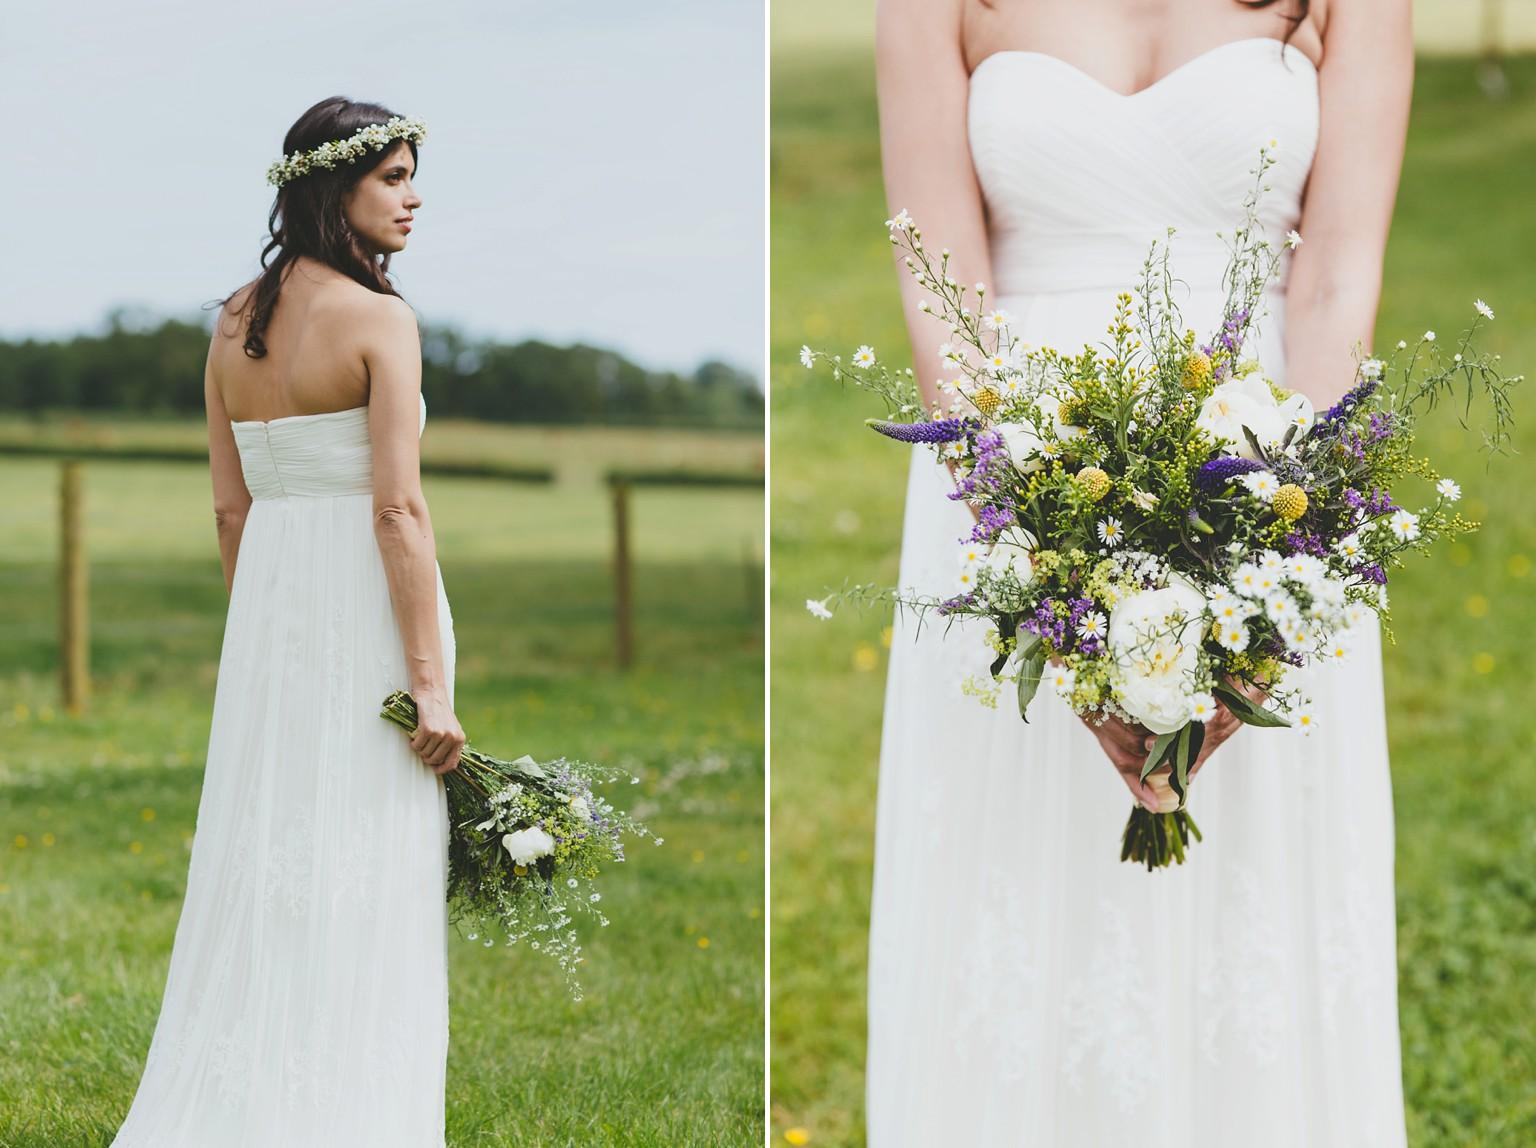 Creative-wedding-photographers-00005